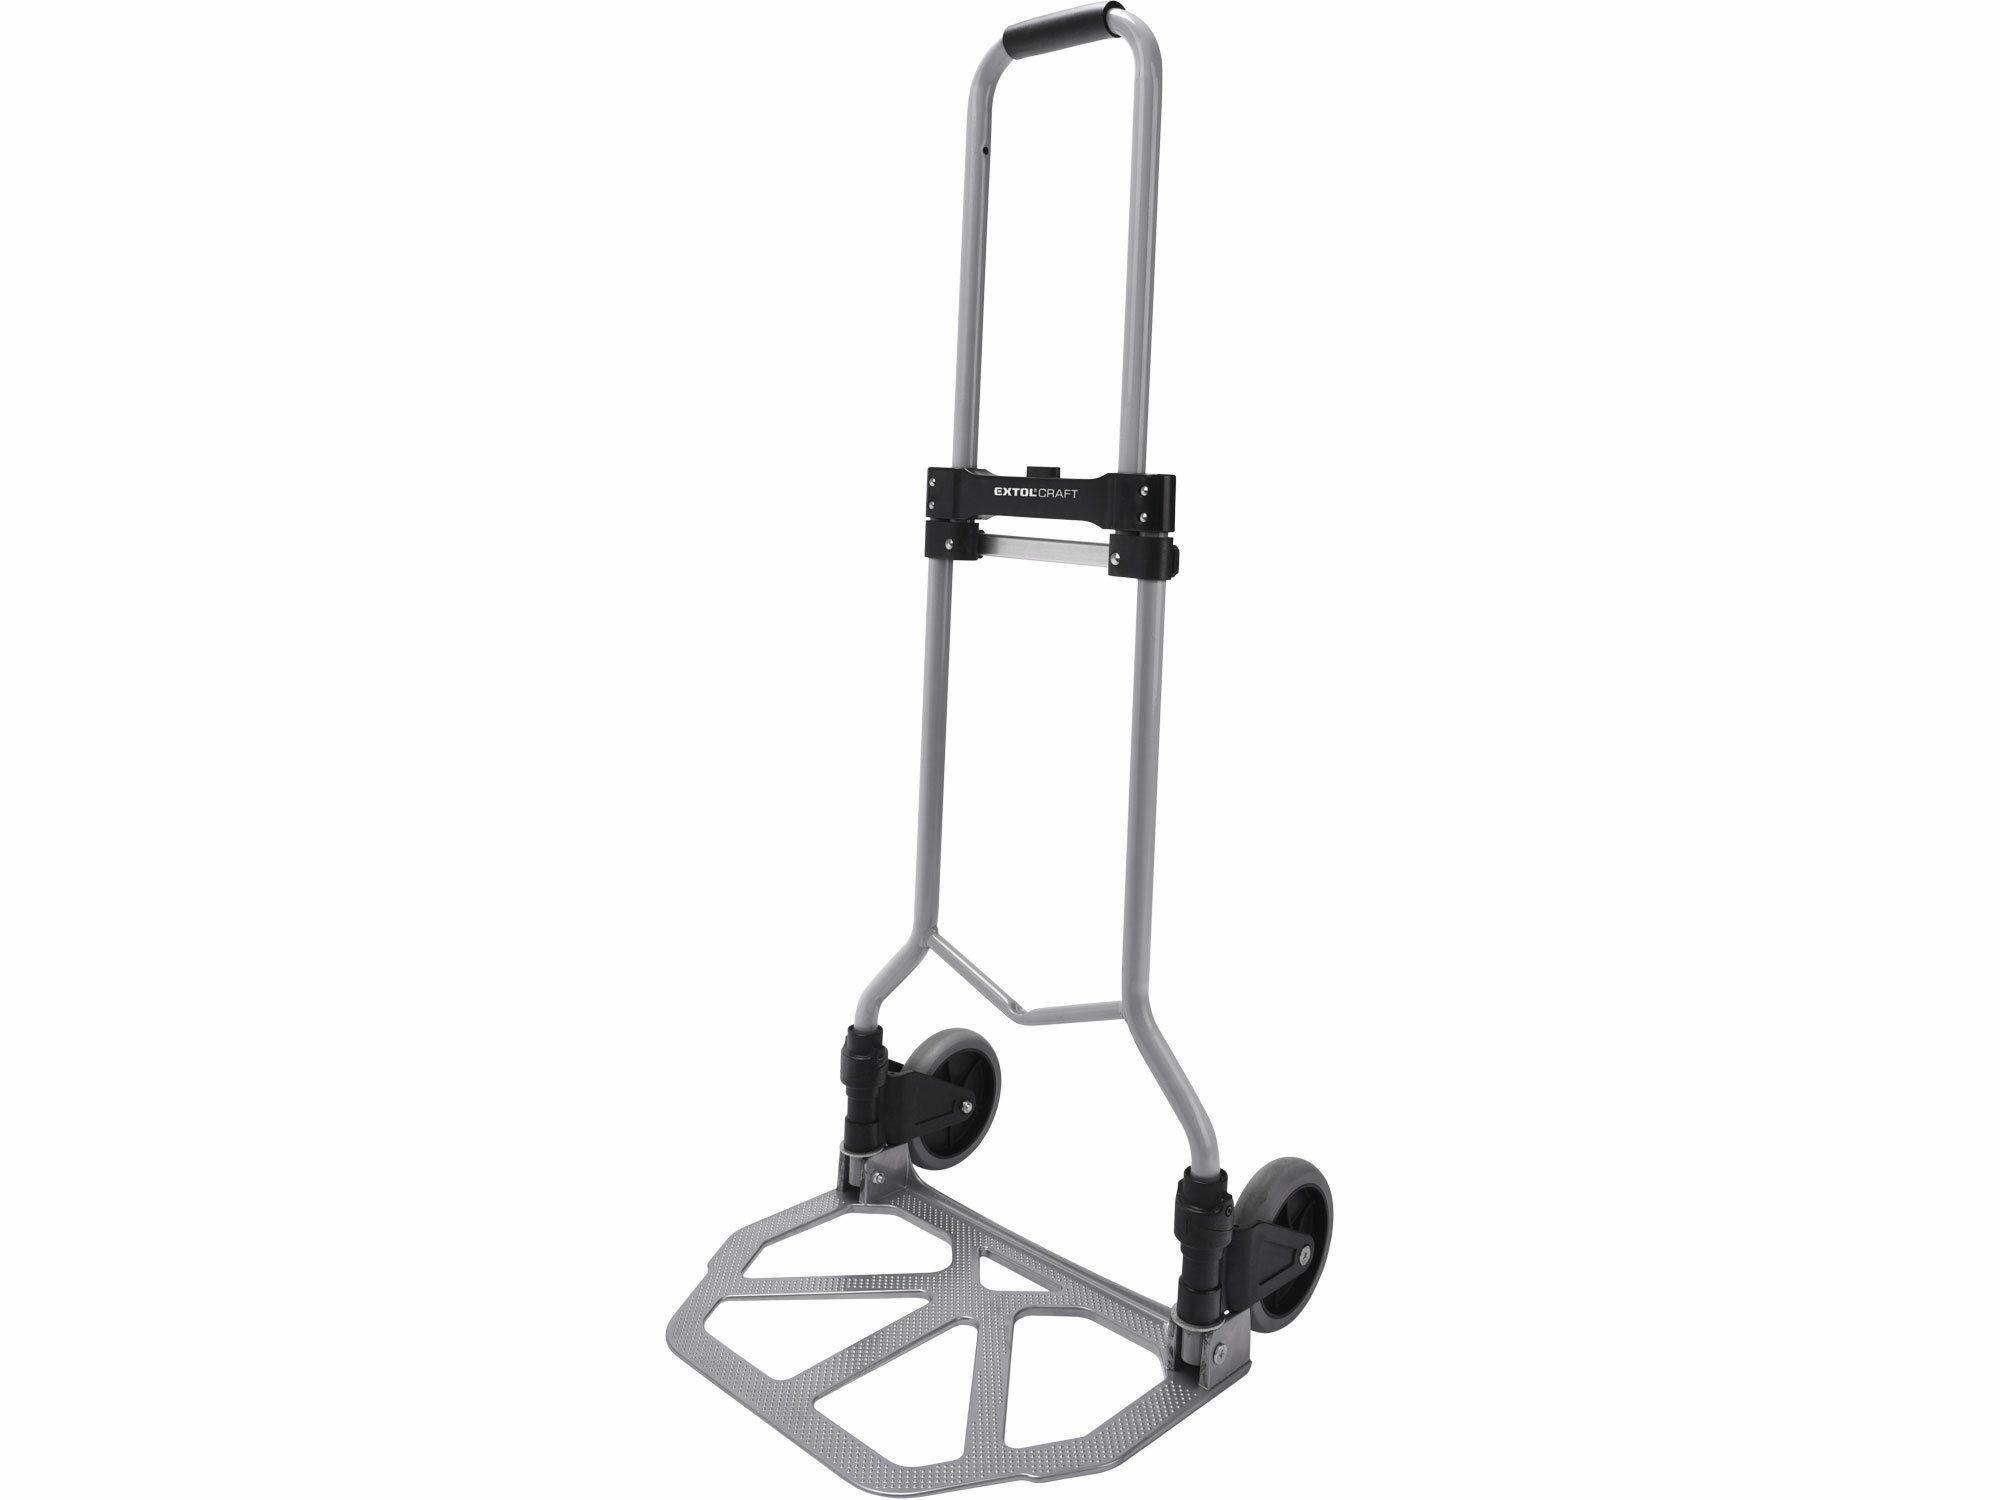 Vozík-rudl skládací EXTOL-CRAFT